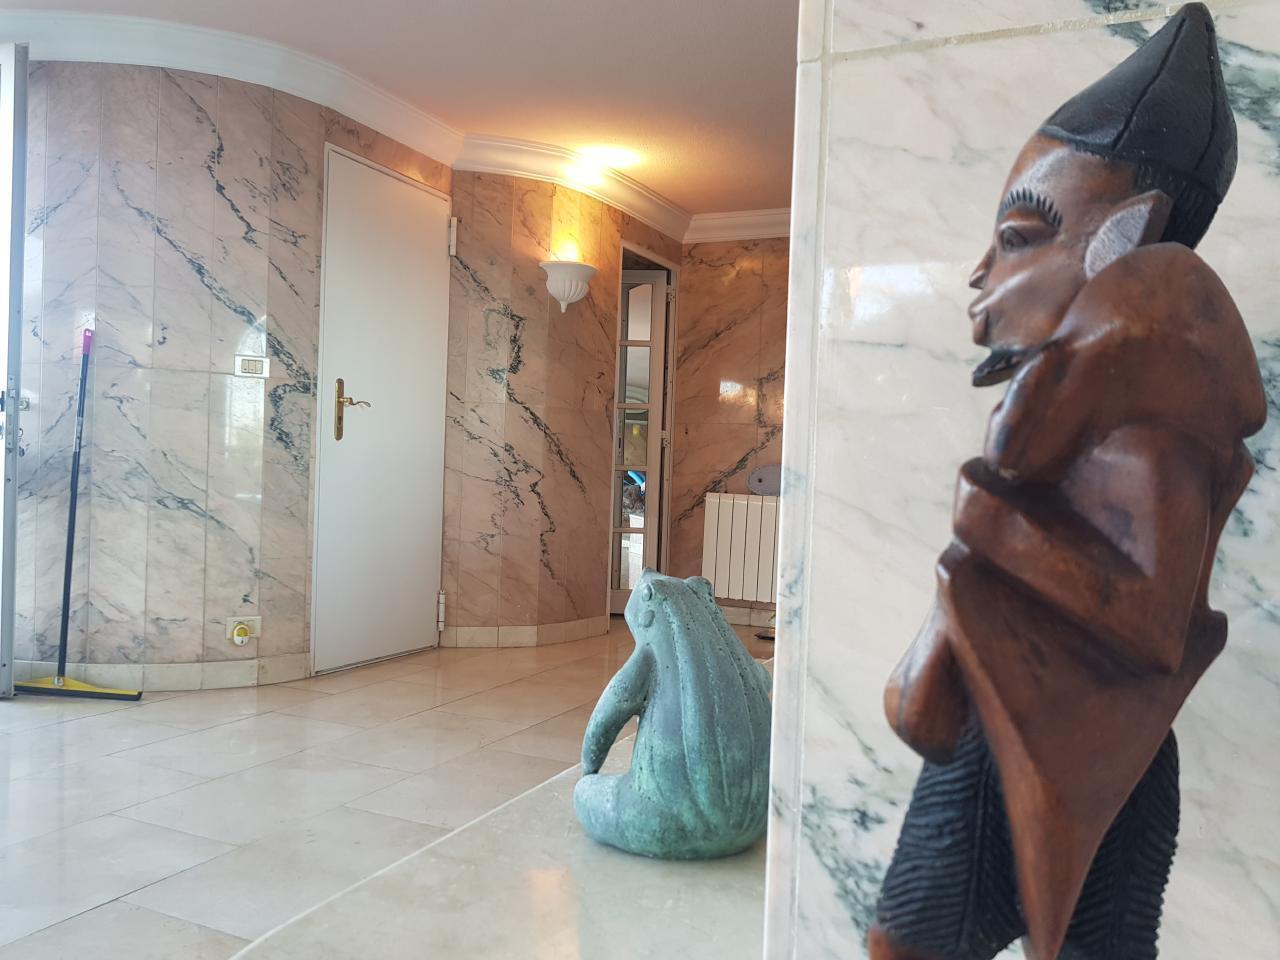 Appartement de vacances Villa Larnia Familien Apartment   * Urlaub für Körper, Geist und Seele * (2529406), El Sauzal, Ténérife, Iles Canaries, Espagne, image 11